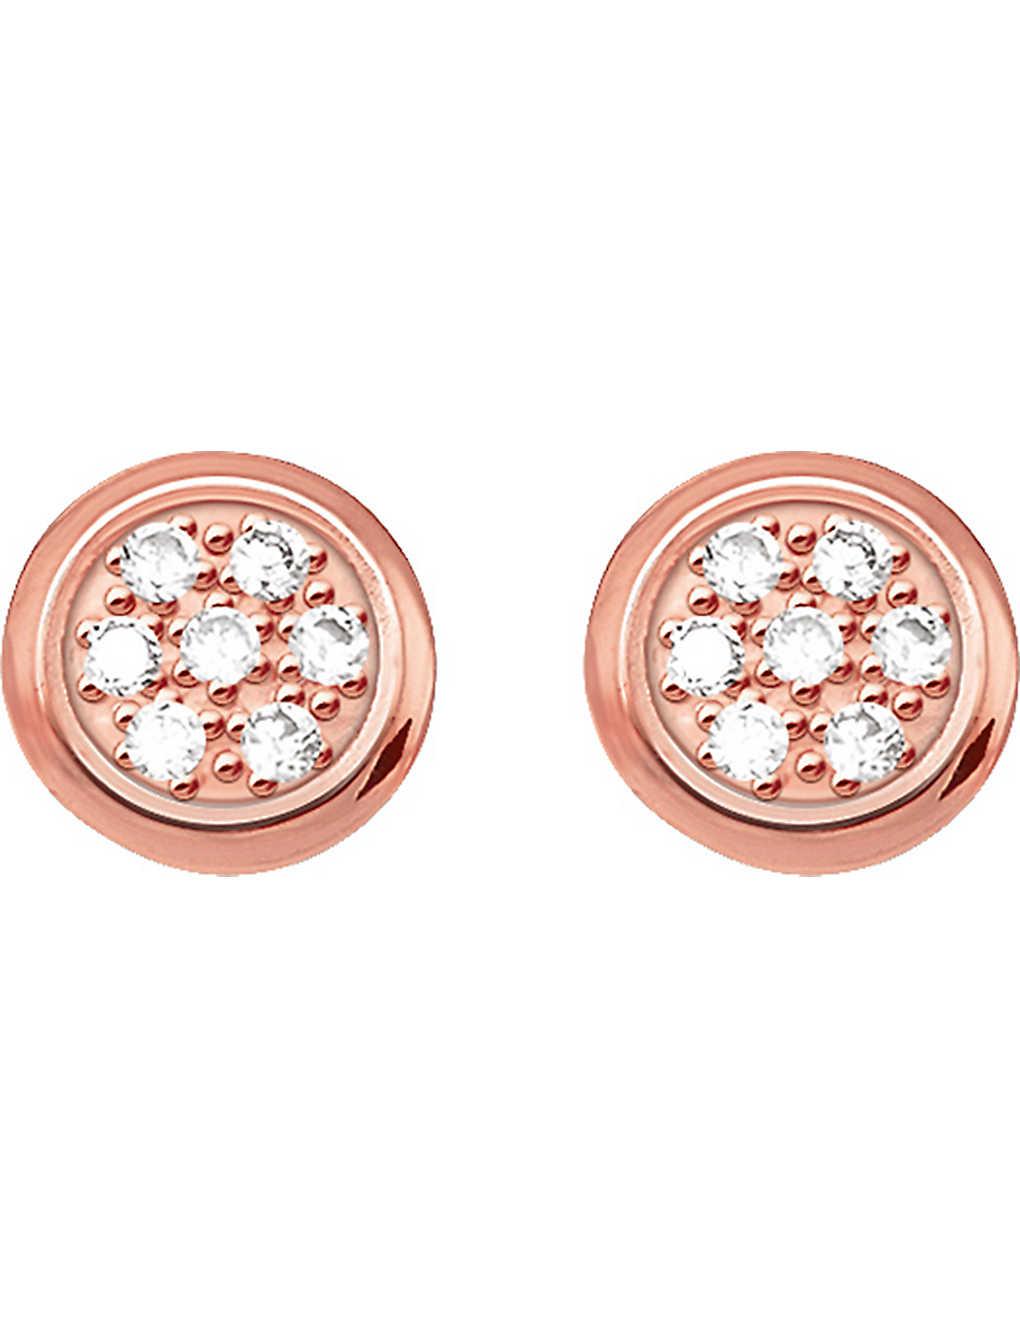 00b8c1db7 THOMAS SABO - Glam & Soul rose gold-plated and diamond studs ...